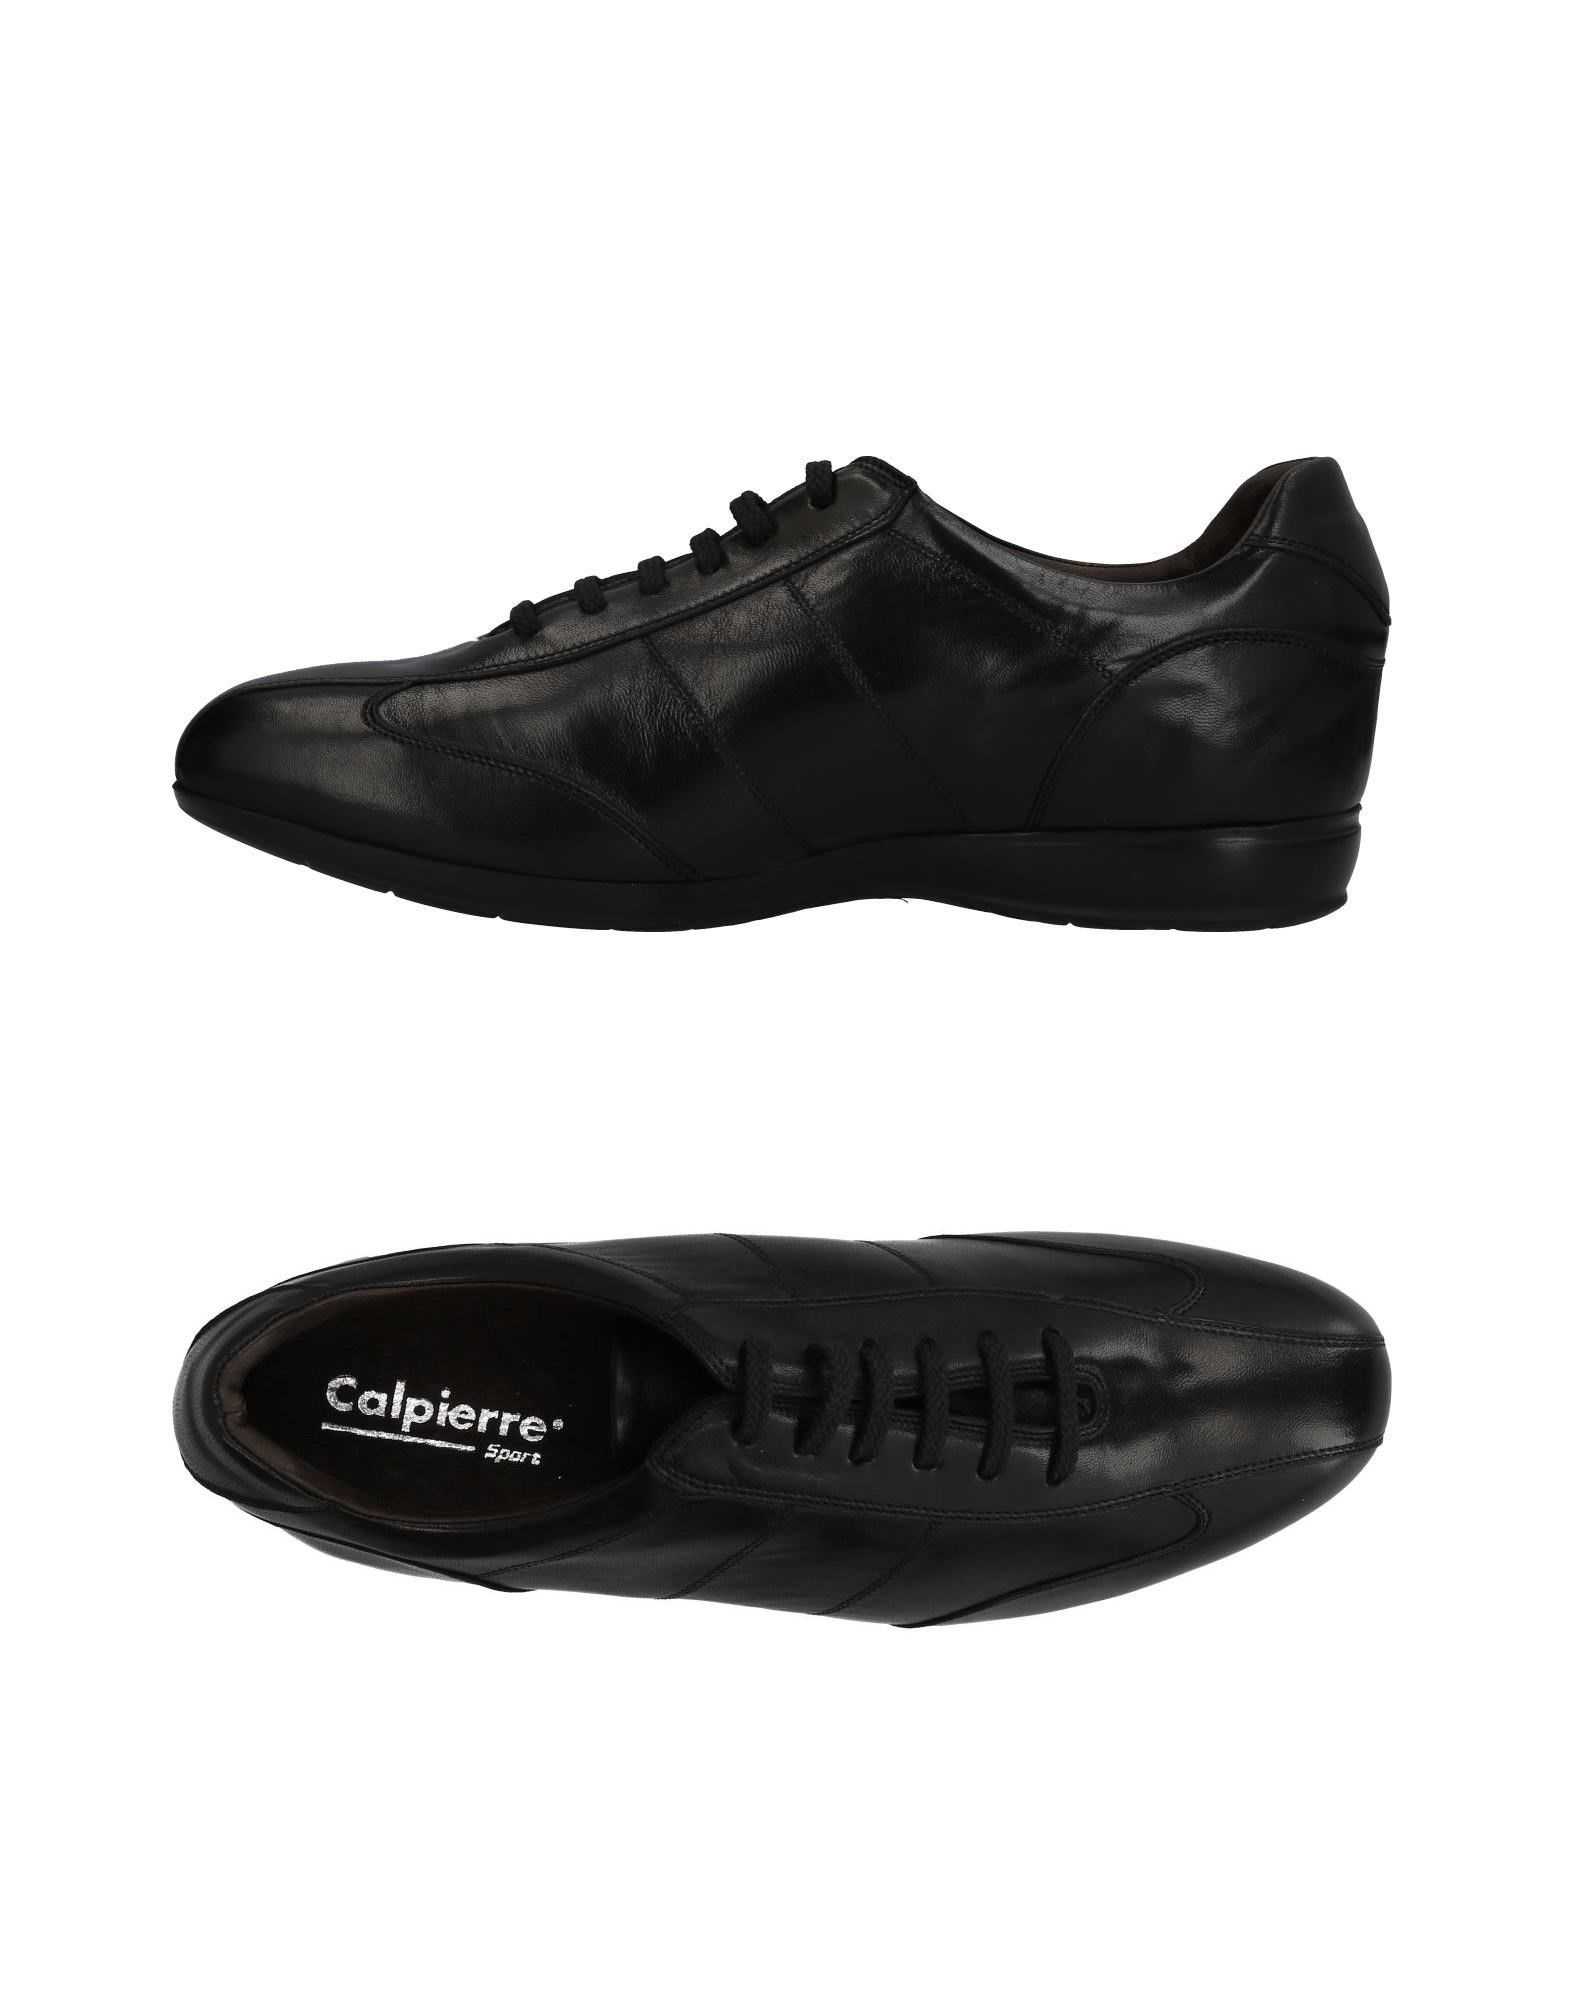 Sneakers Calpierre Donna - Acquista online su